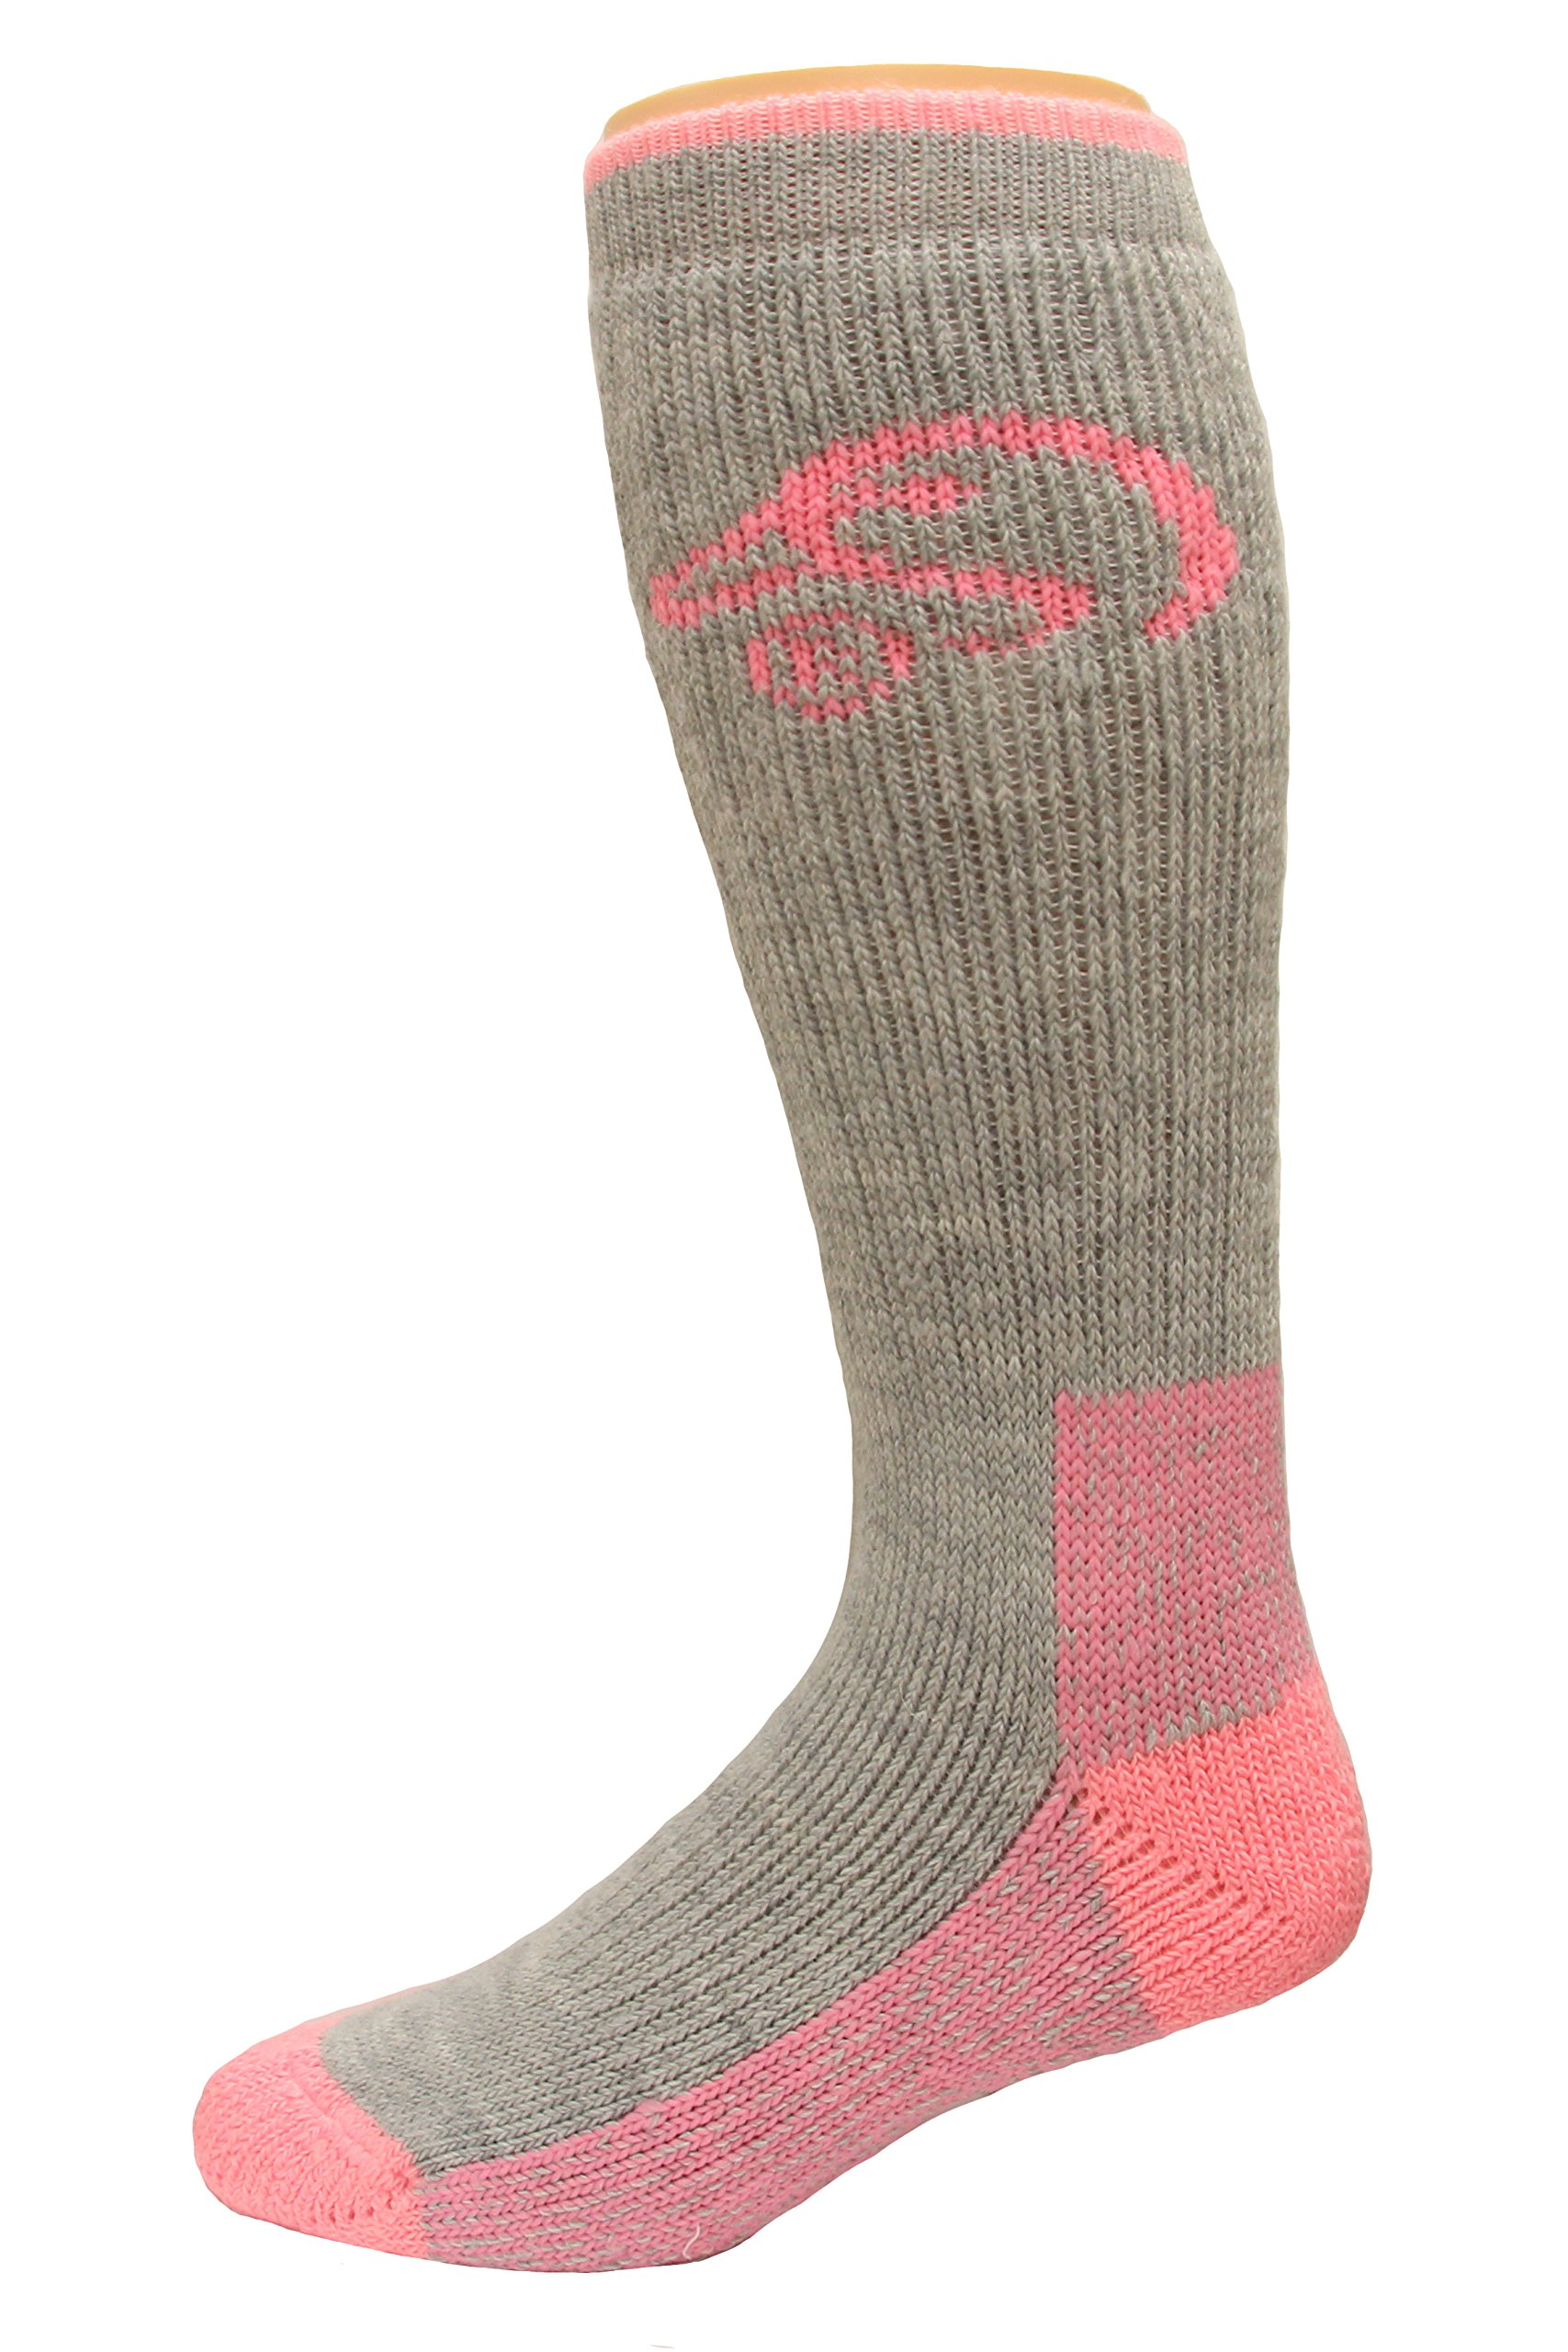 Ducks Unlimited Women's Comfy House Socks, Gray, Medium